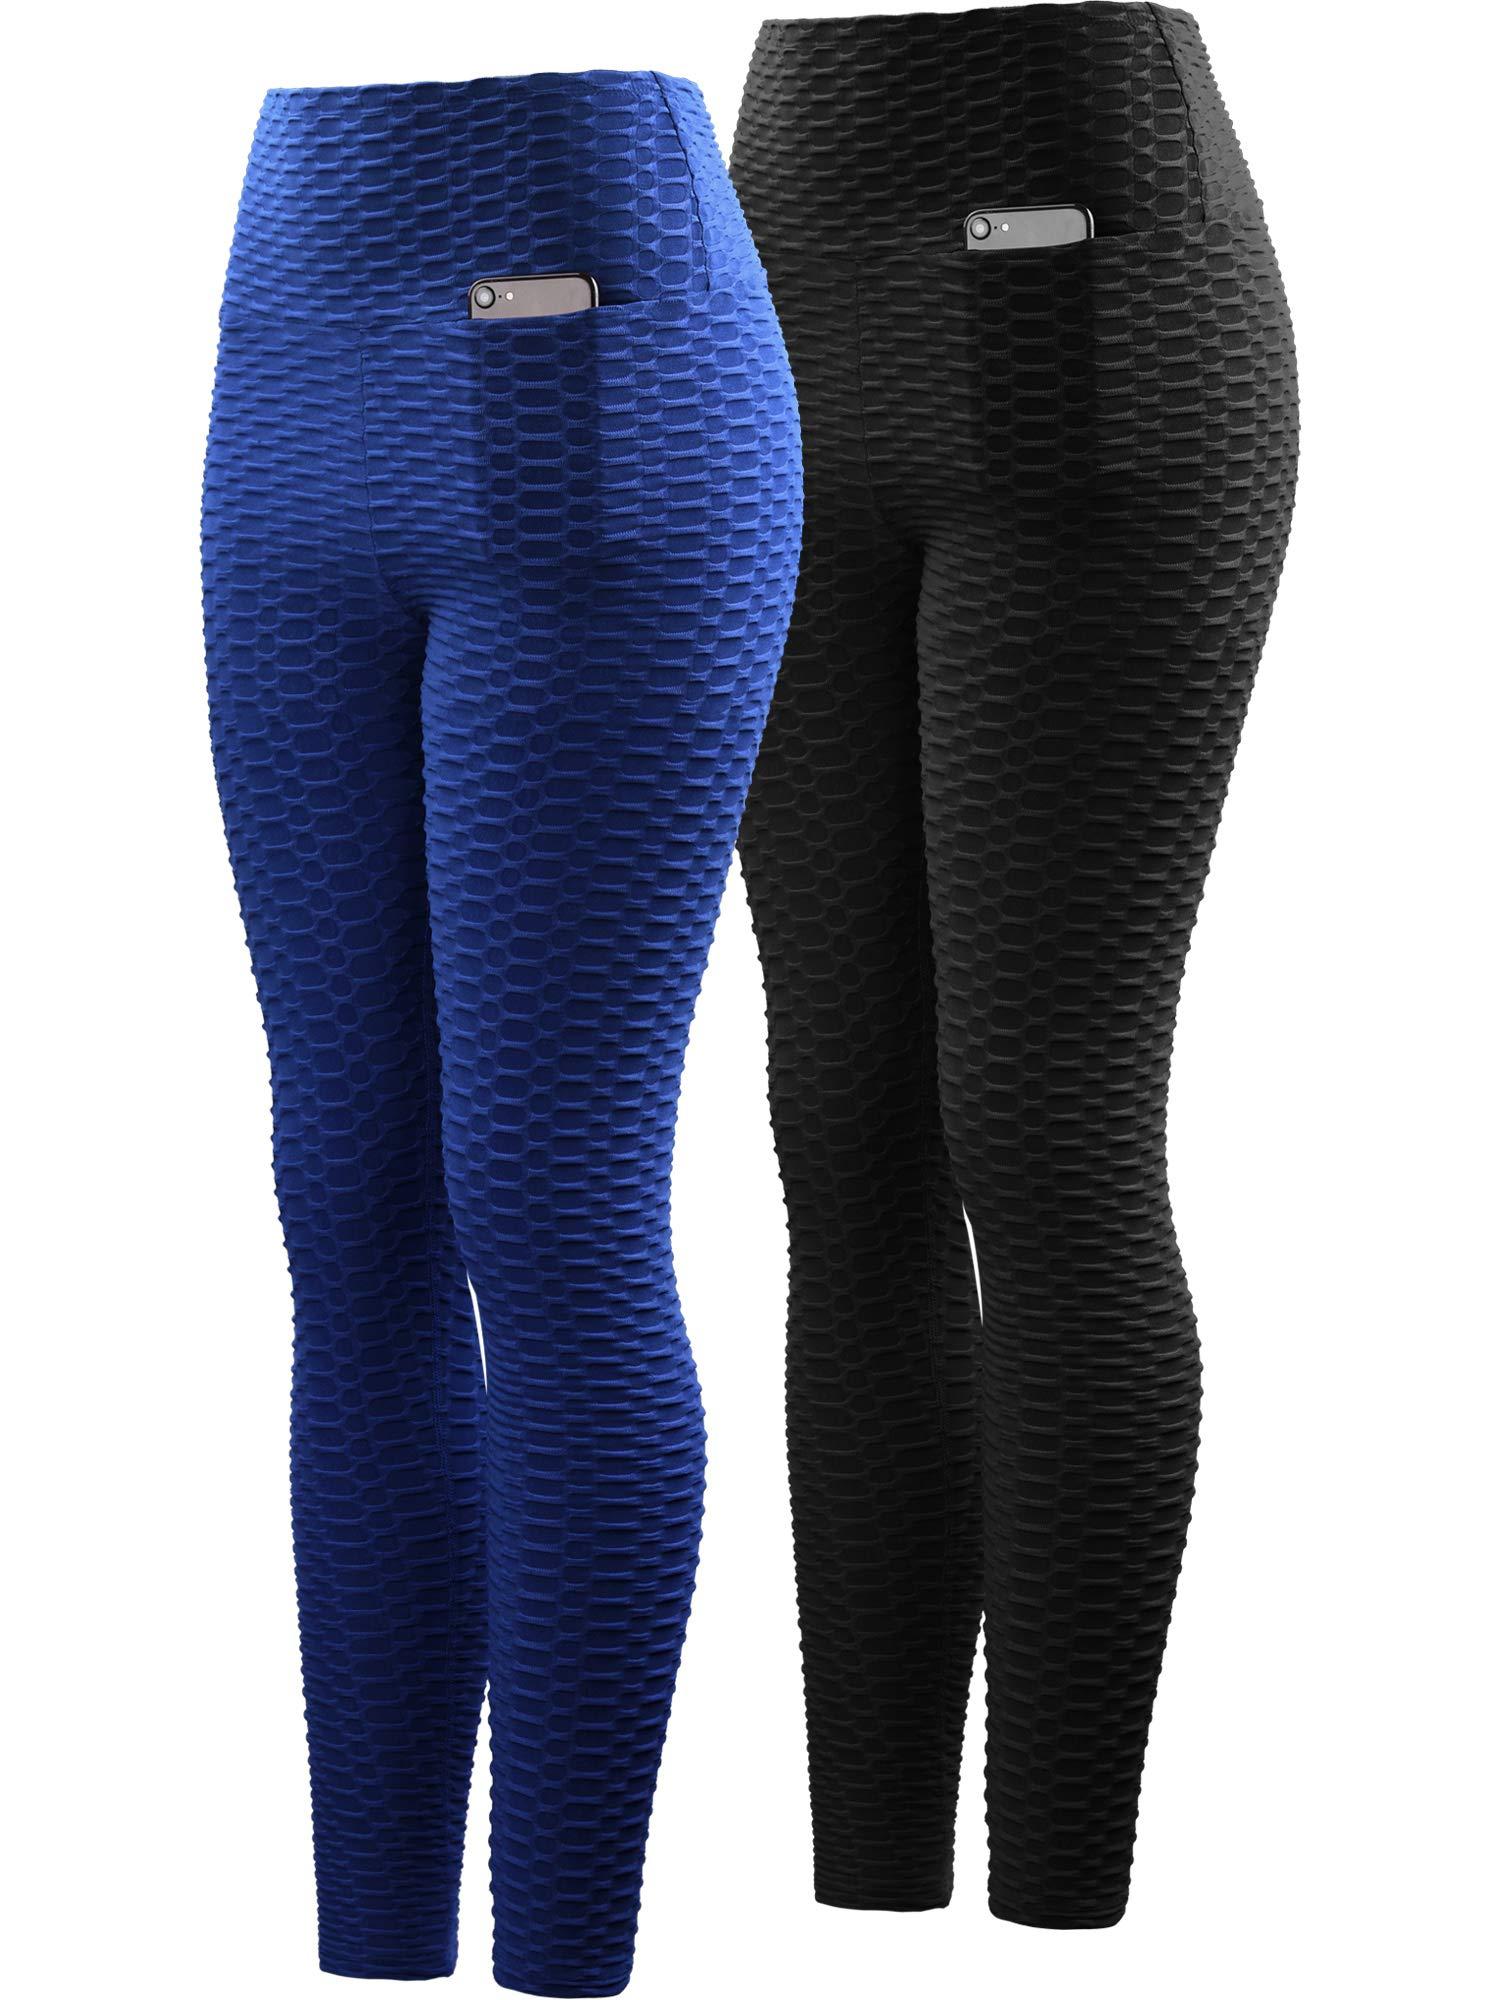 Neleus Women's 2 Pack Tummy Control High Waist Leggings Out Pocket,9036,Black/Blue,S,EU M